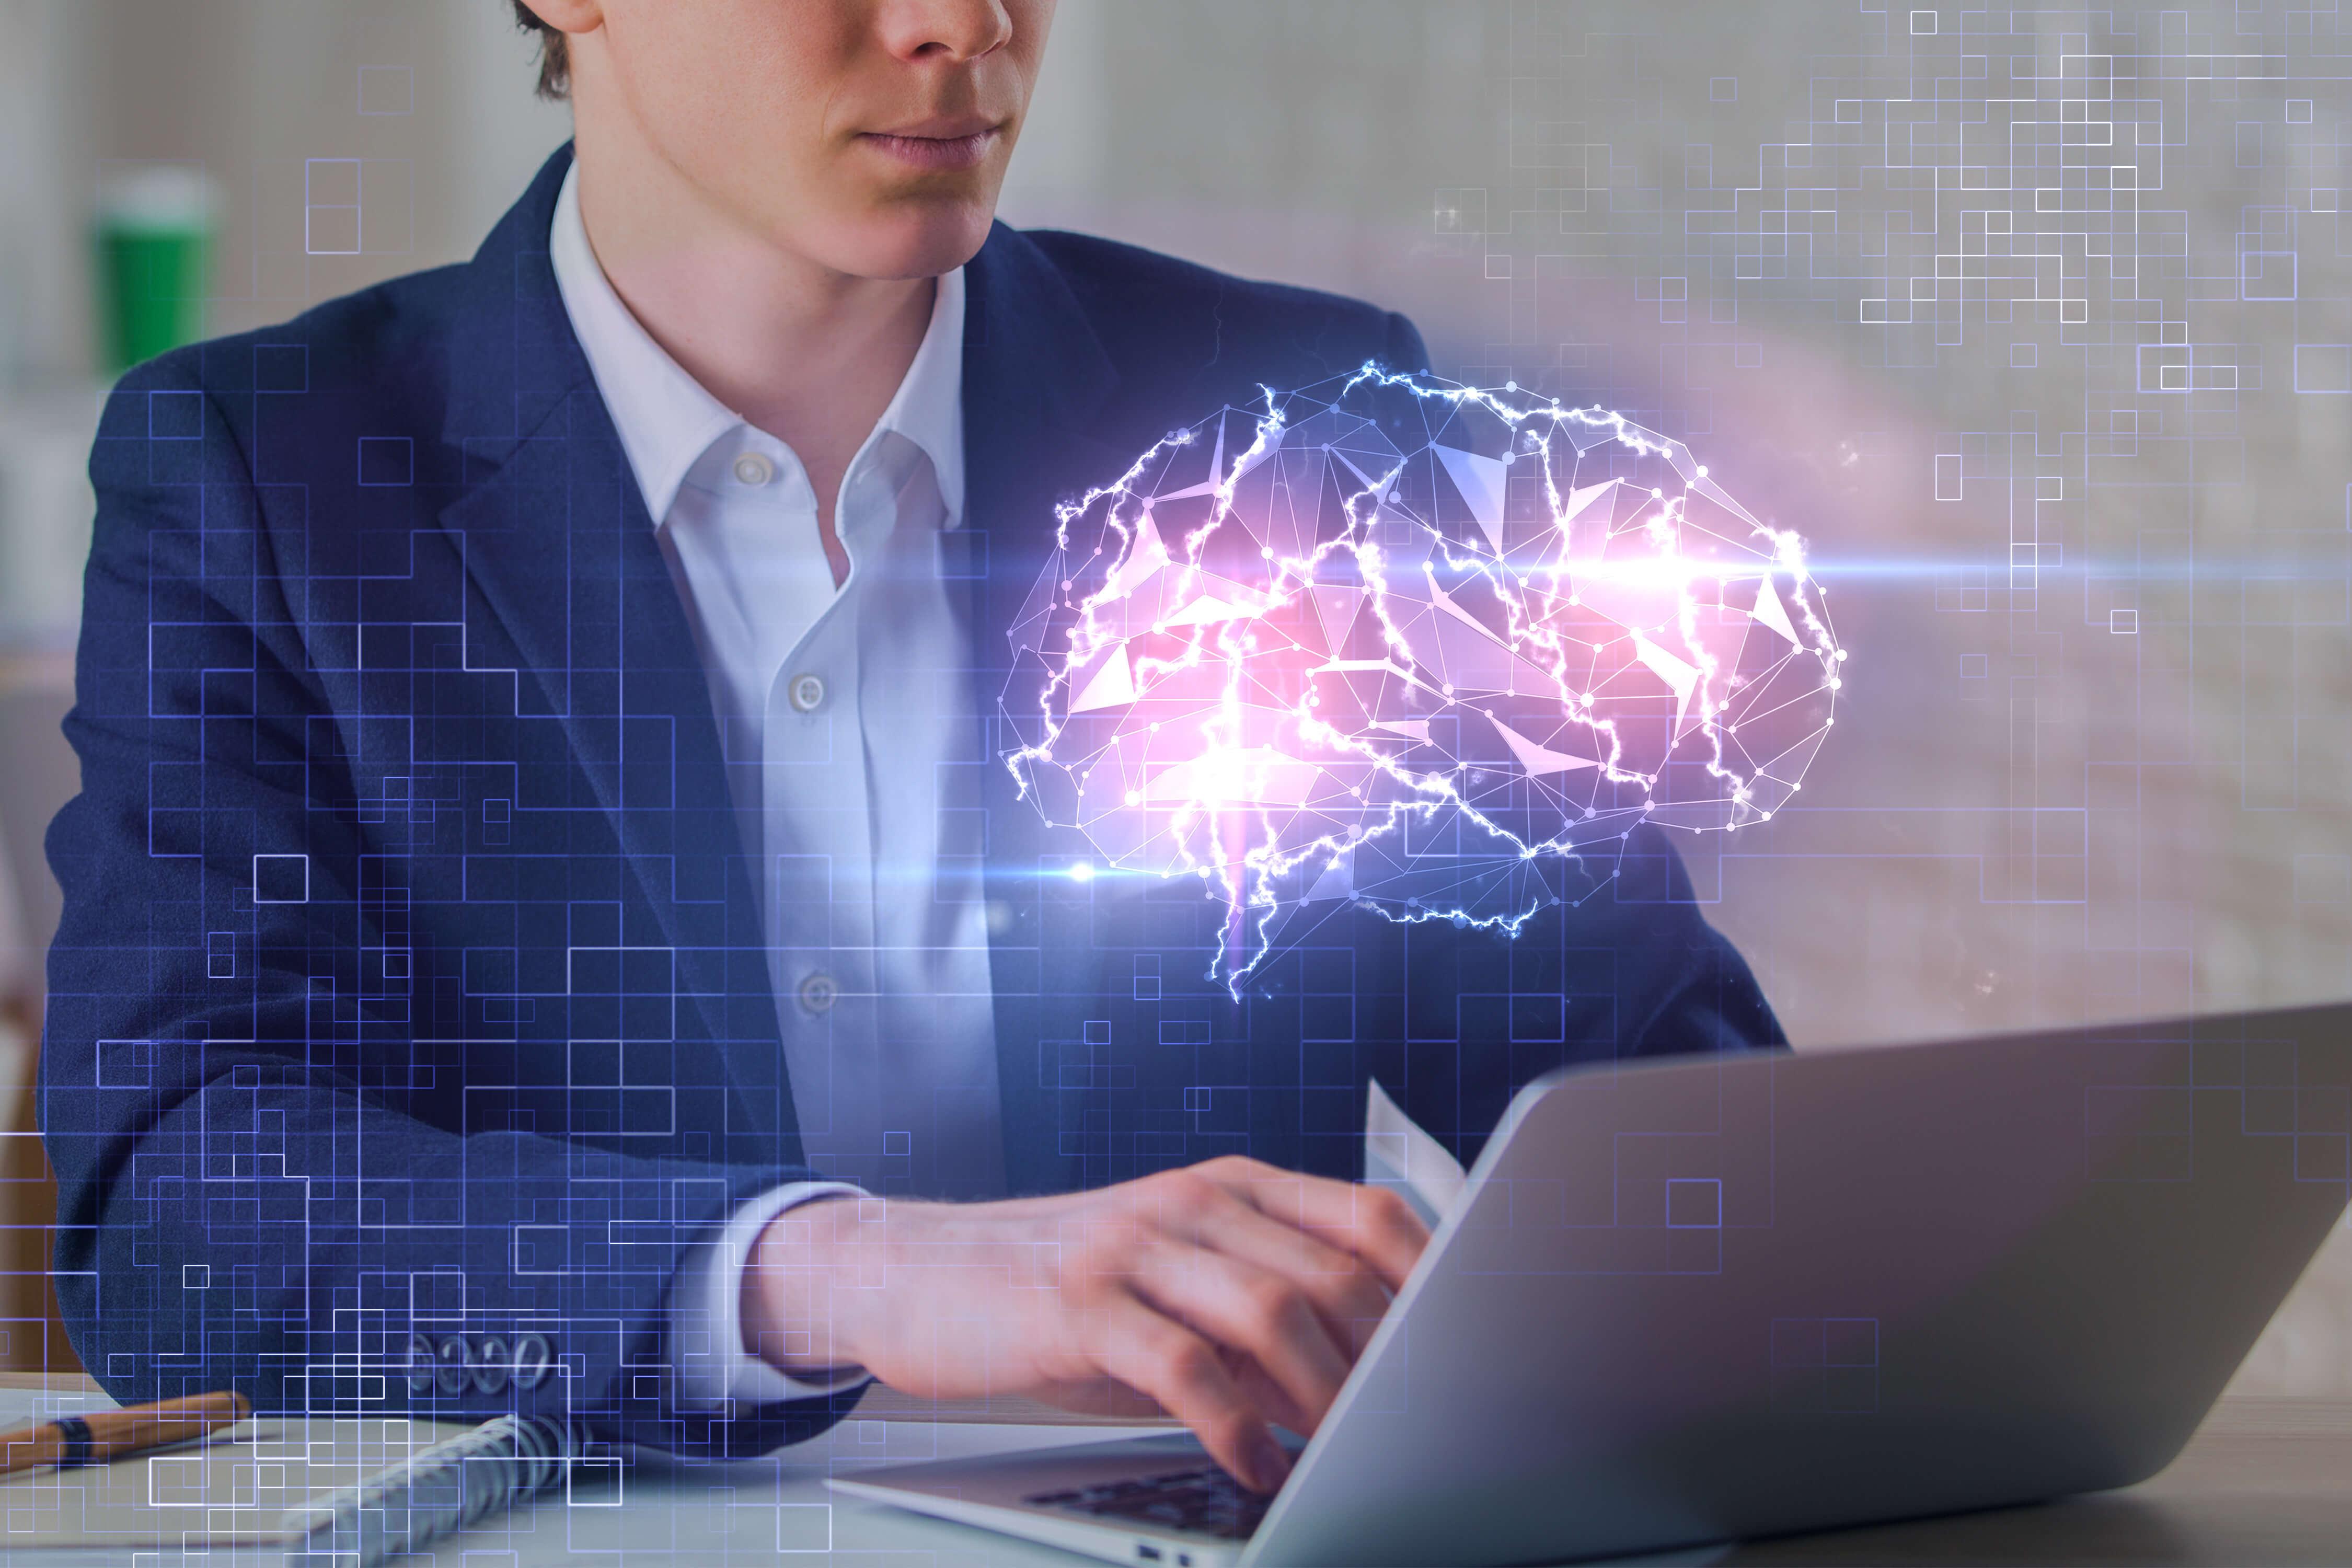 xAI Toolkit: Practical, Explainable Machine Learning